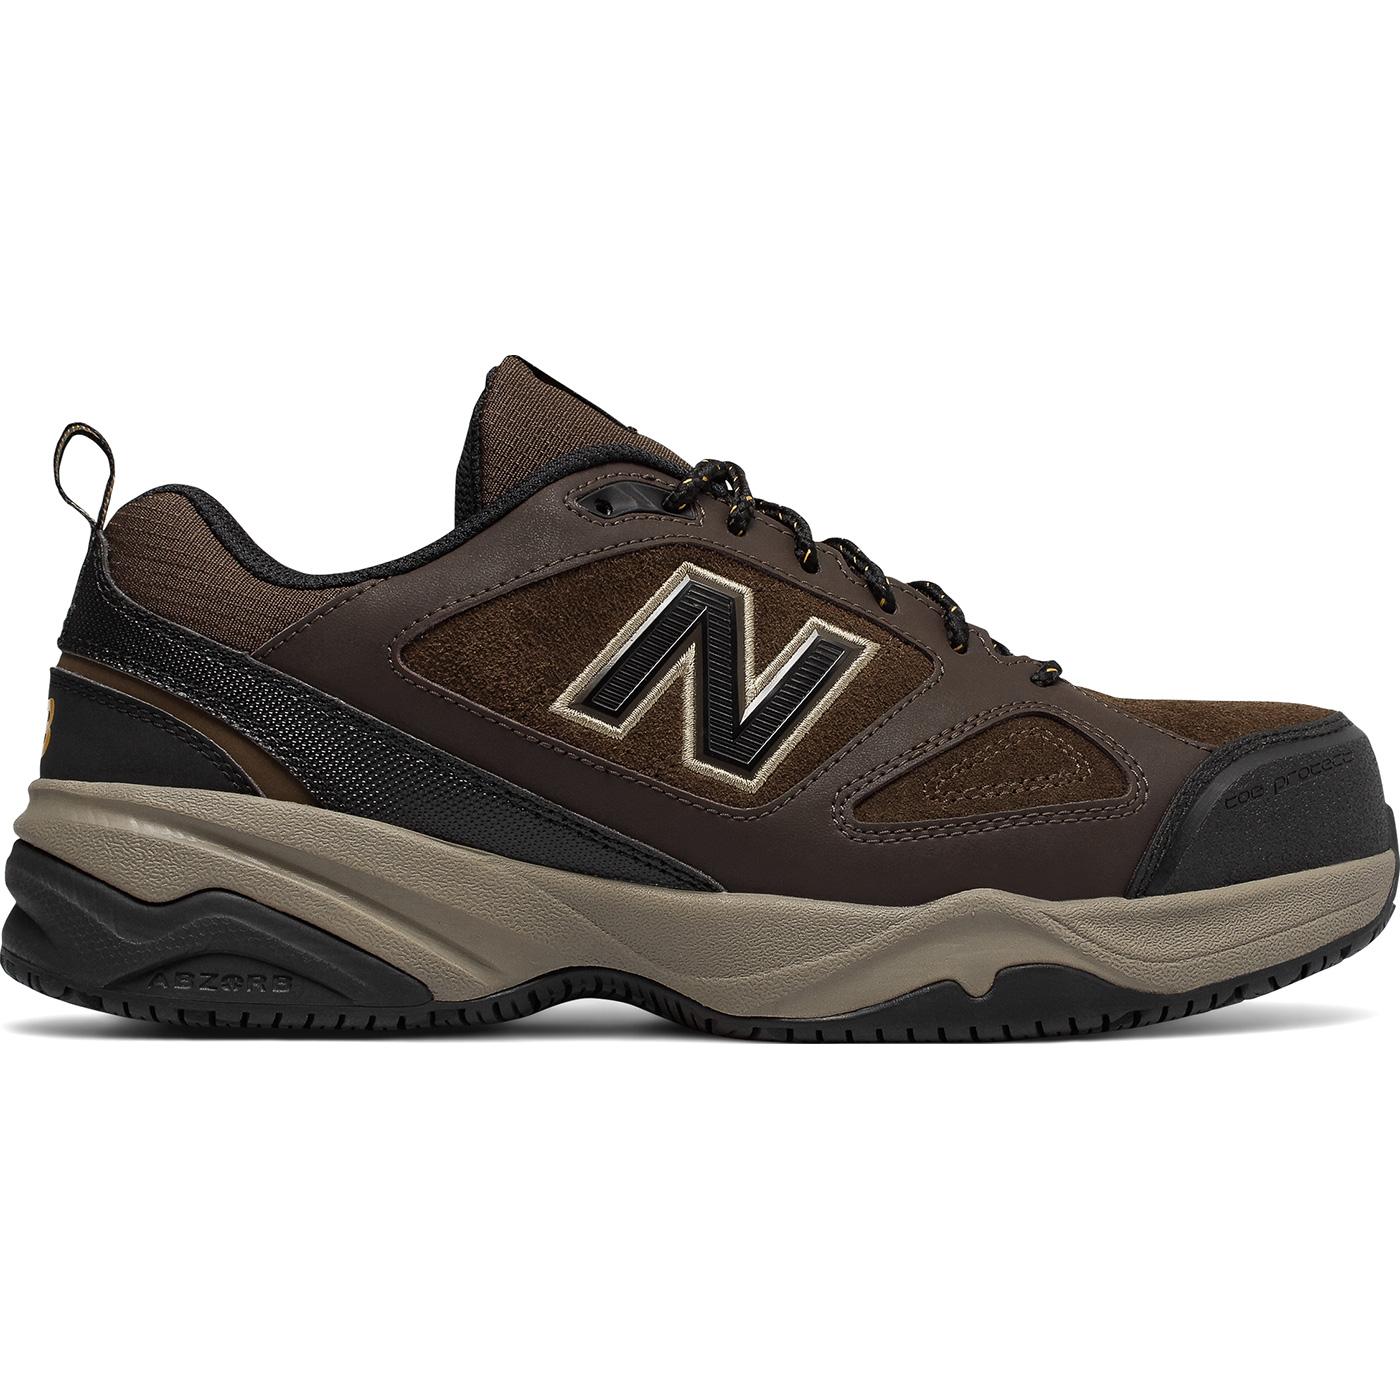 New Balance Work Schuhe Günstig Kaufen New Balance